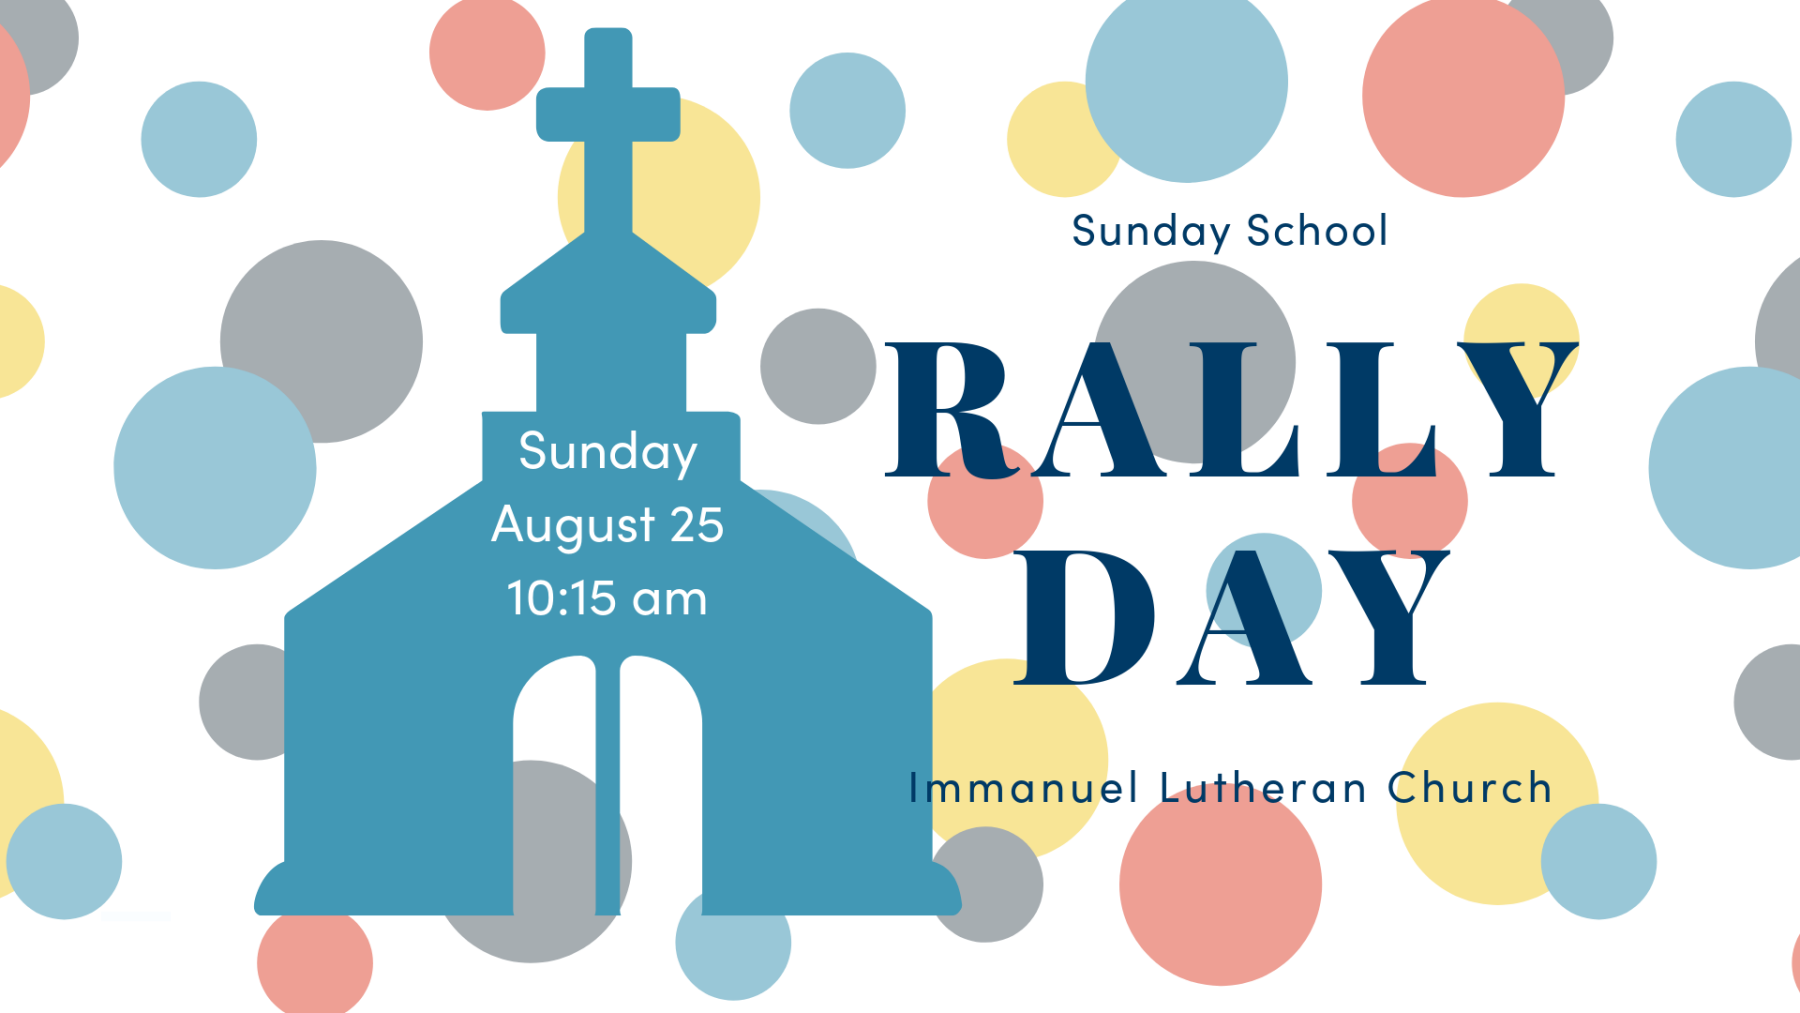 Sunday School Rally Day